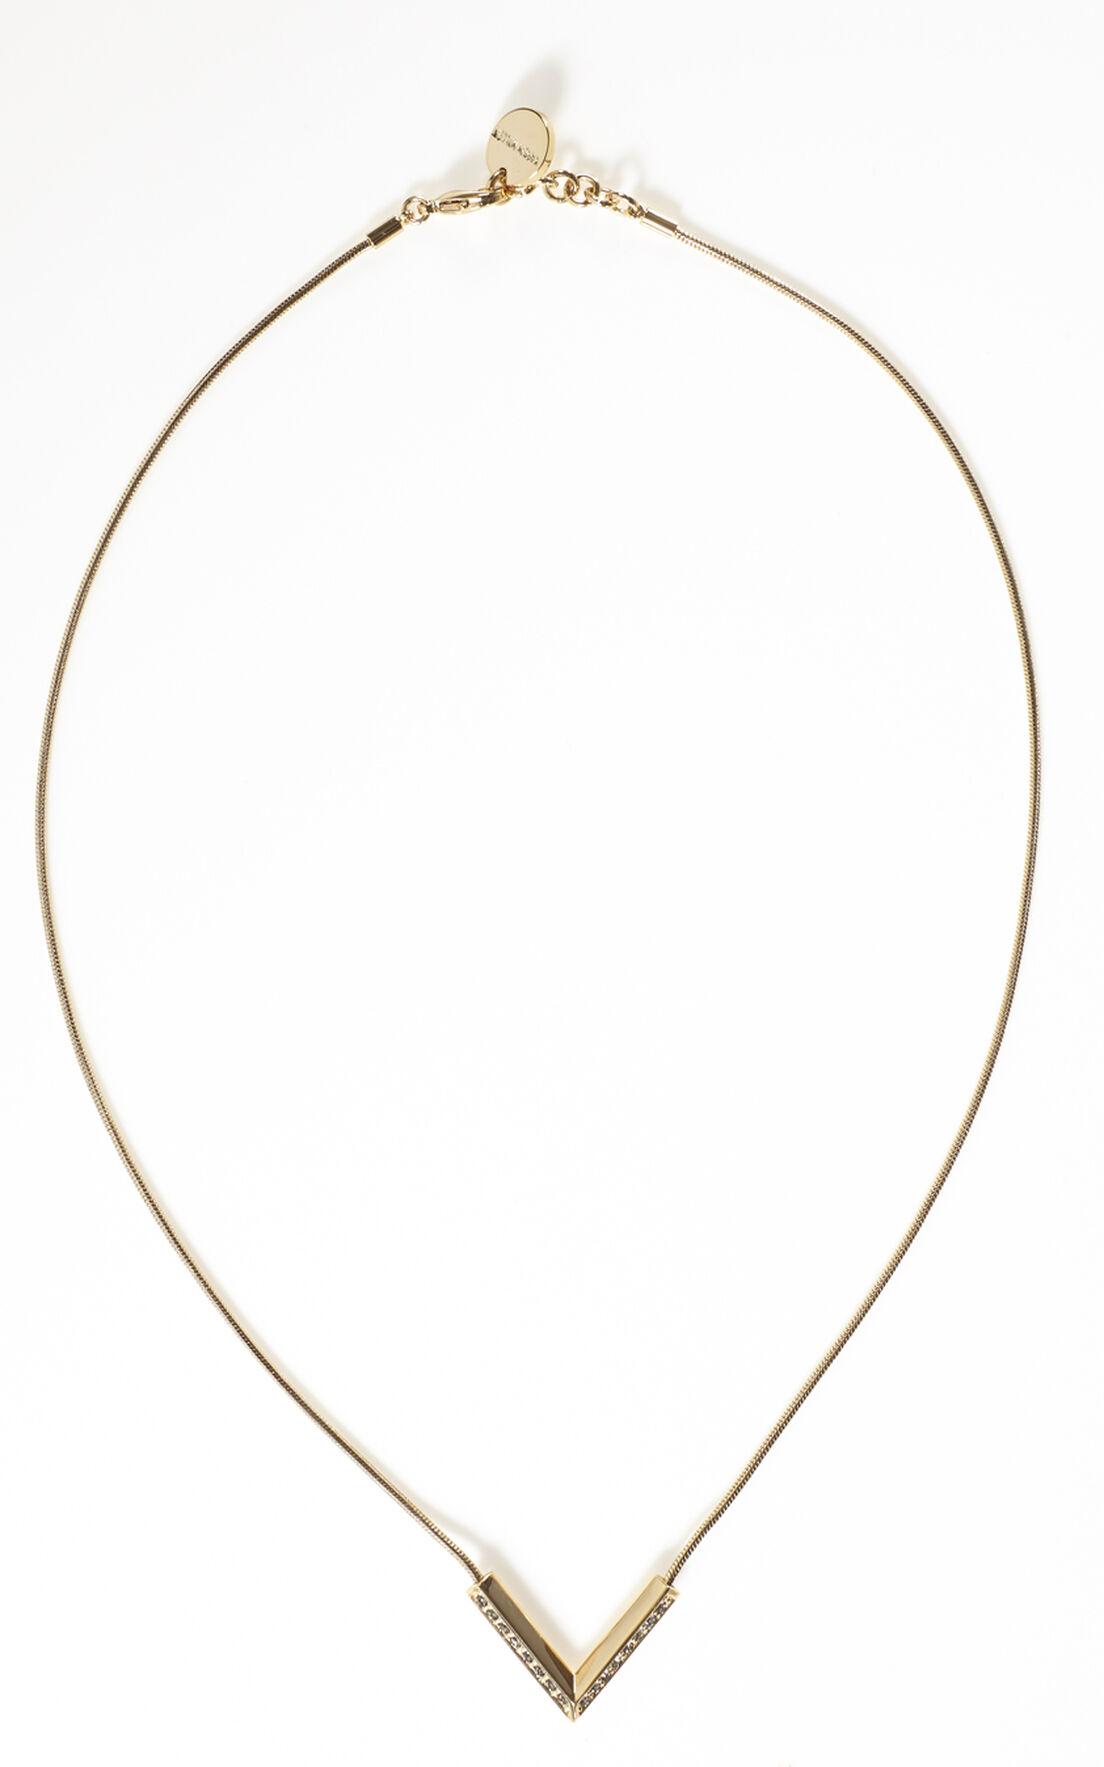 Karen Millen, Angle Crystal Necklace Gold Colour 0